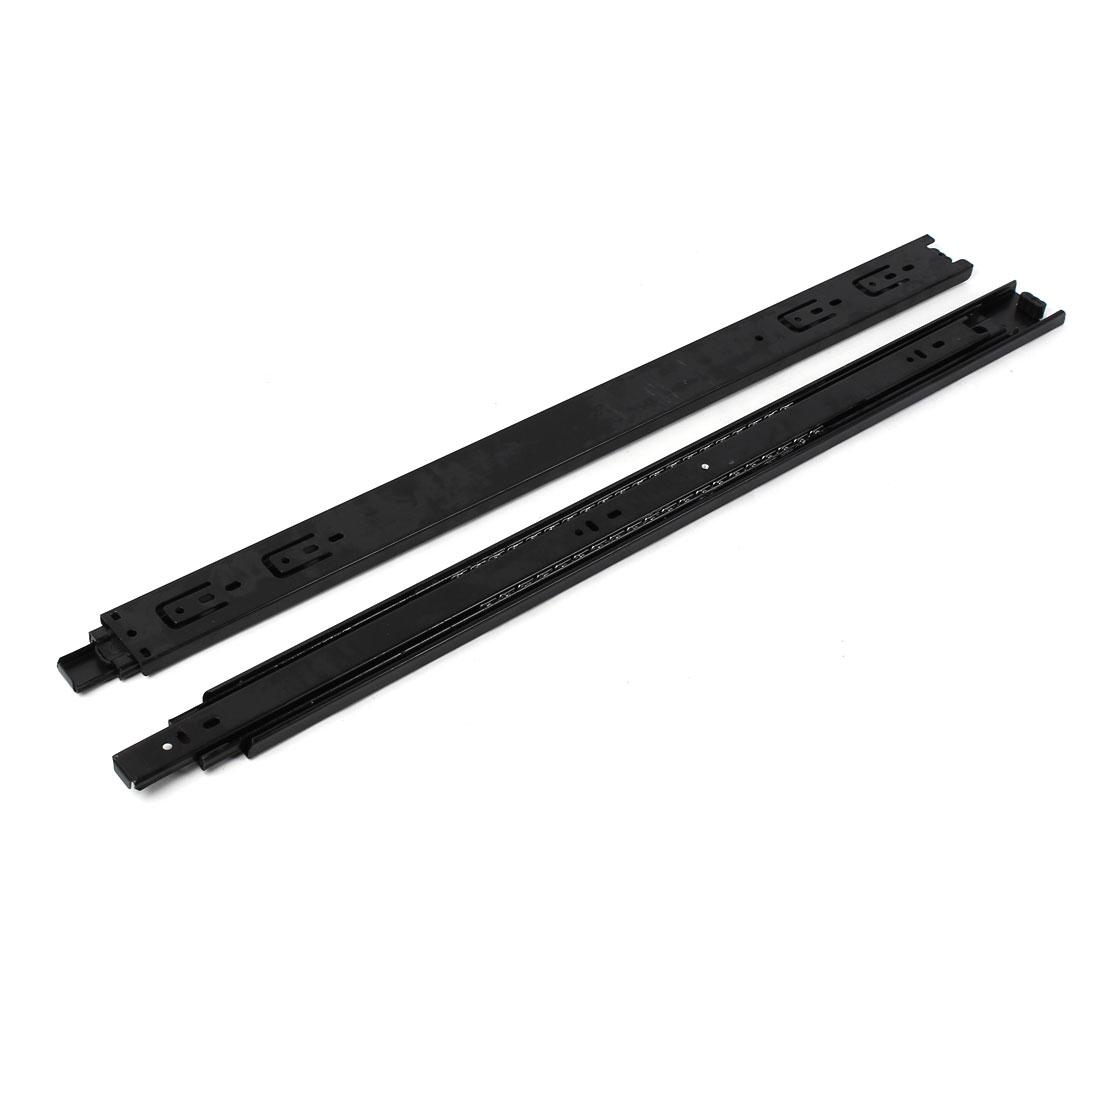 "2 Pcs Black Full Extension Ball Bearing Drawer Smooth Slides Rail 24"""